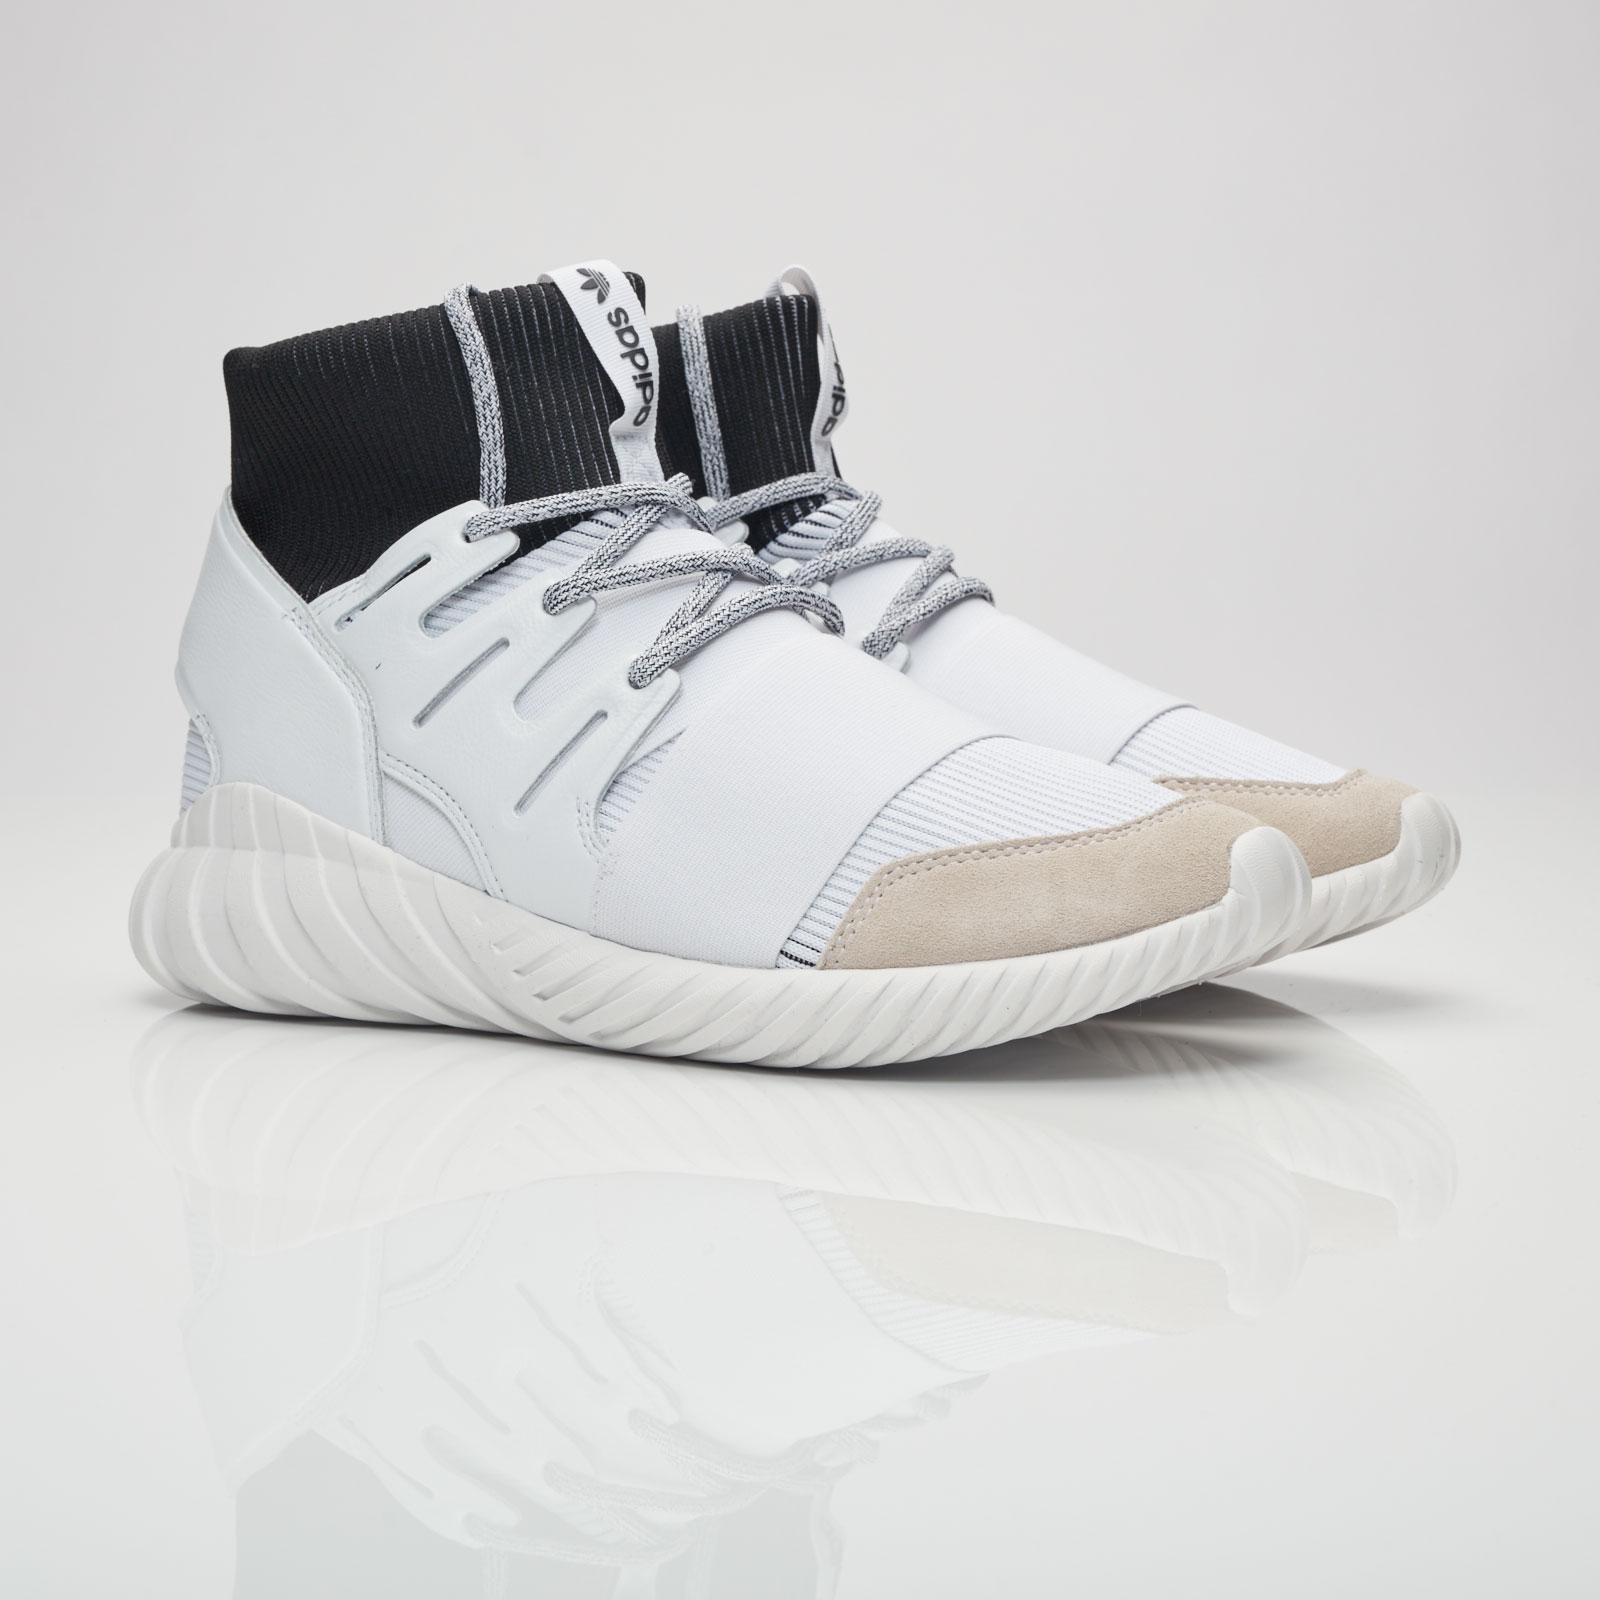 big sale 557ed 66ec7 adidas Tubular Doom - Ba7554 - Sneakersnstuff | sneakers ...